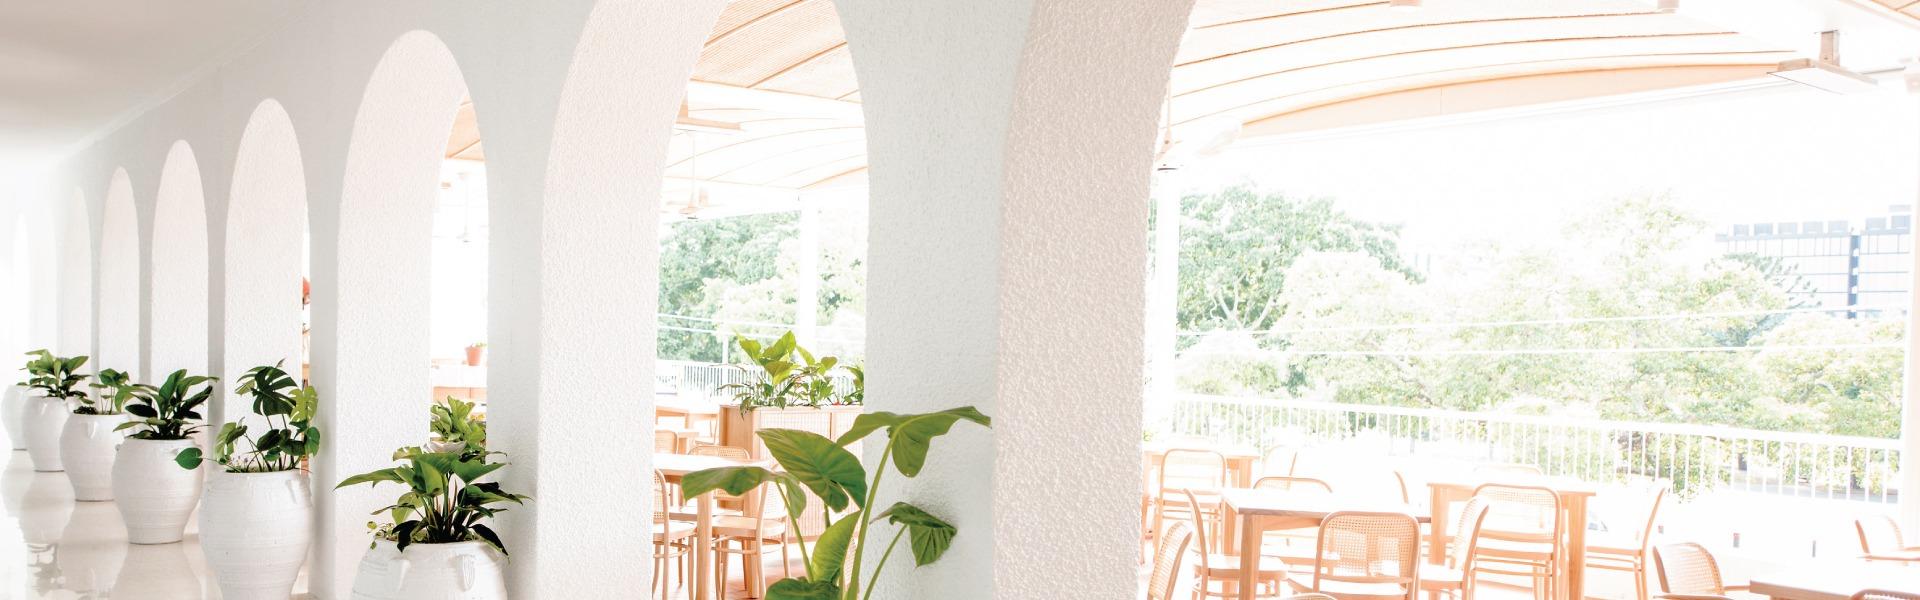 Santorini inspired Venue restaurant in Brisbane